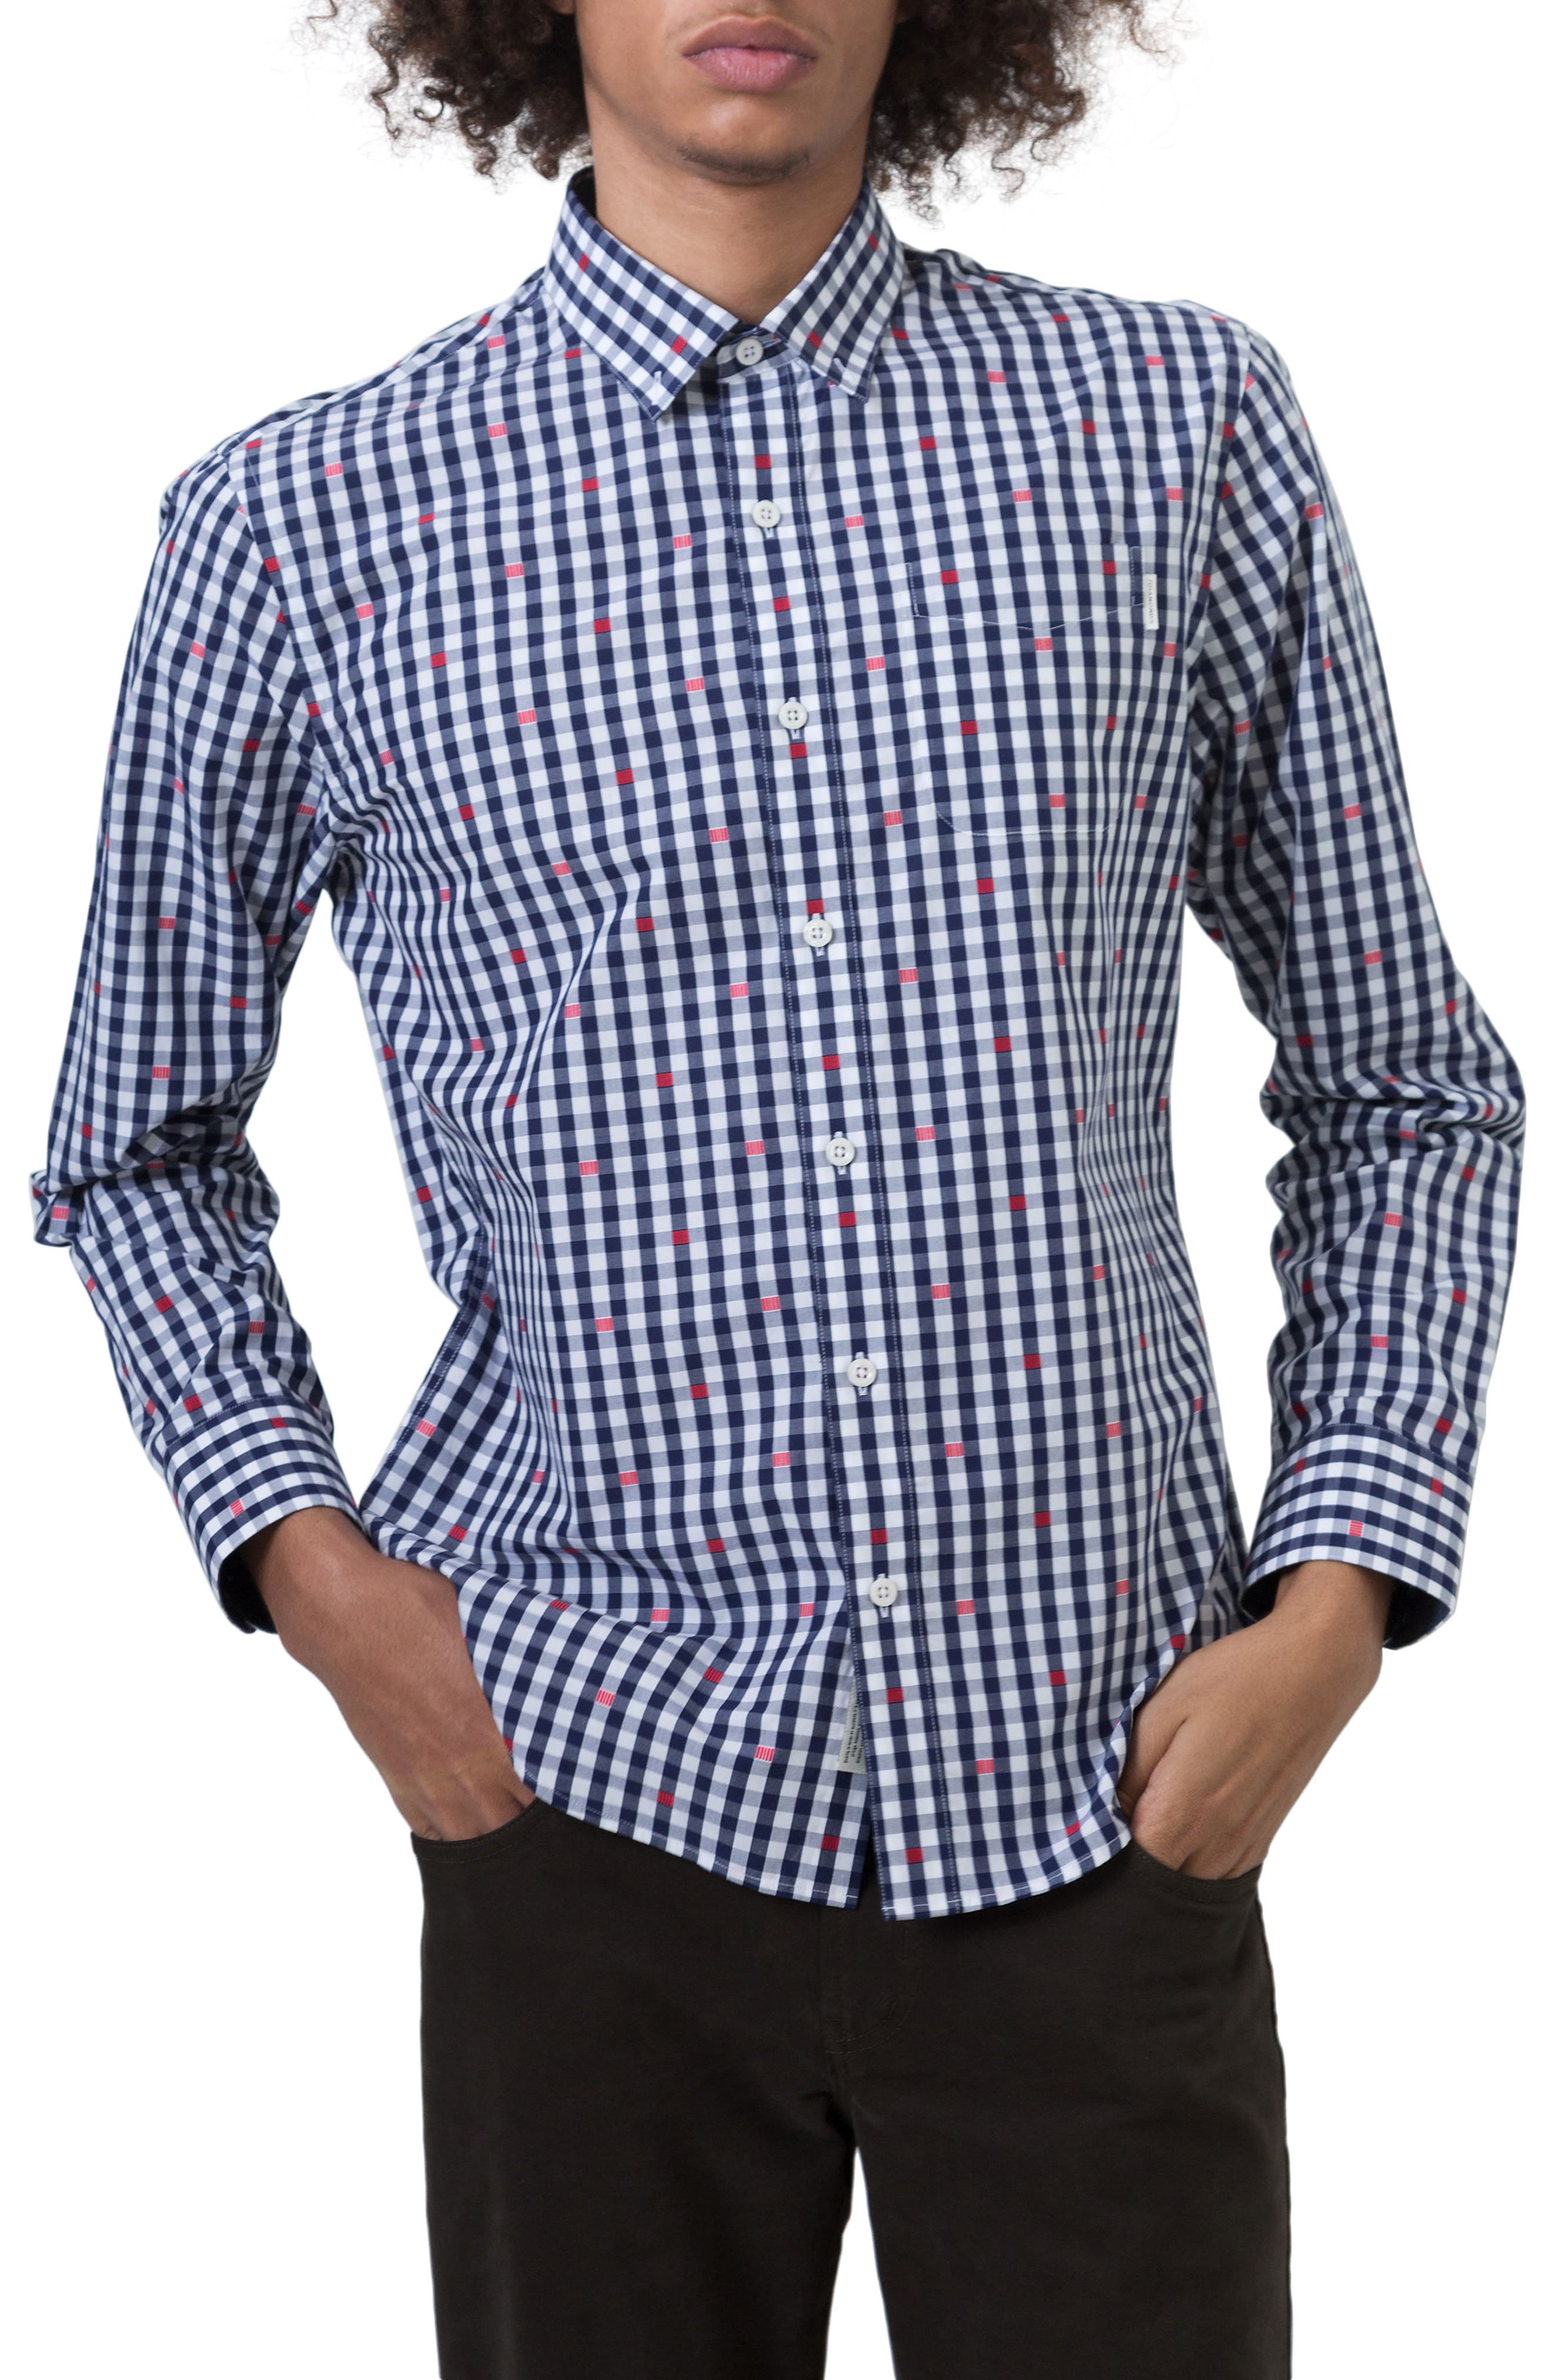 Petrichor Woven Shirt,                             Main thumbnail 1, color,                             Navy